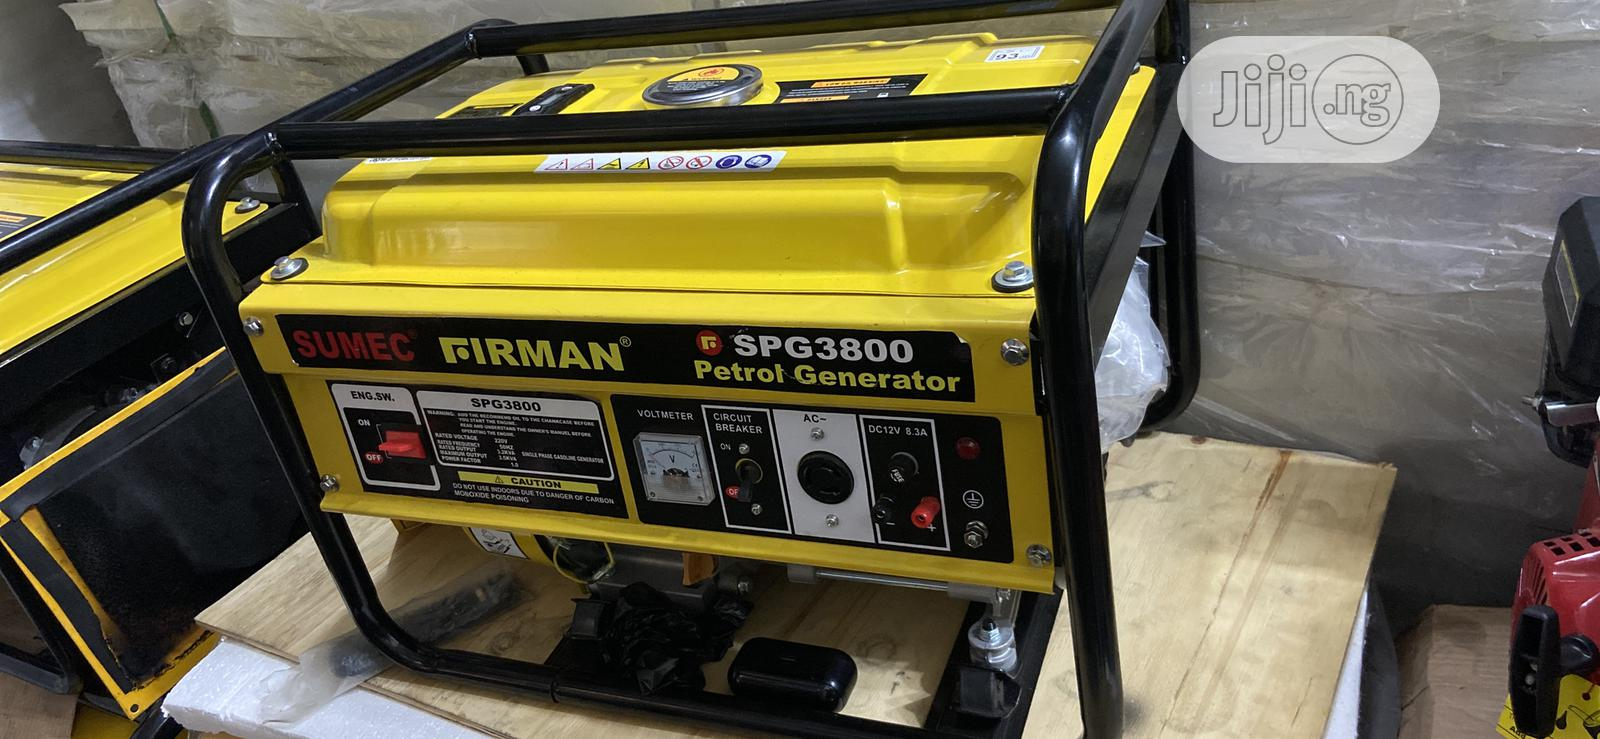 Archive: Sumec Firmam Generator Spg3800